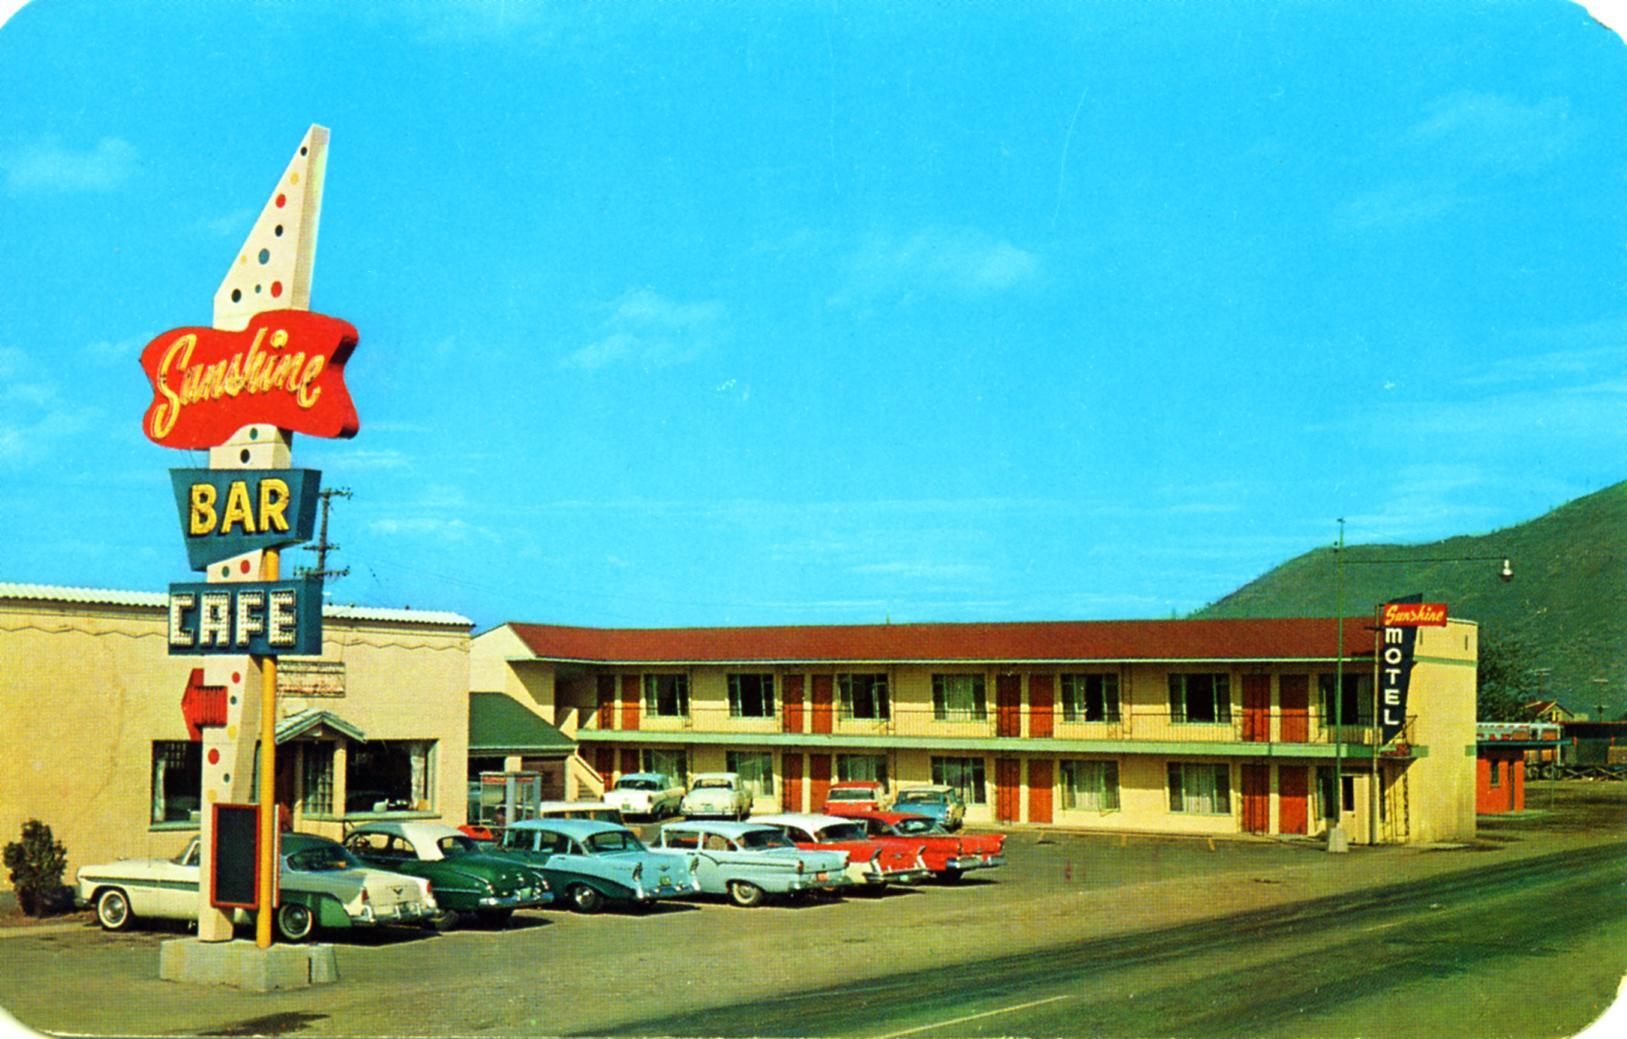 Sunshine Motel - 301 West Cameron Avenue, Kellogg, Idaho U.S.A. - 1950's